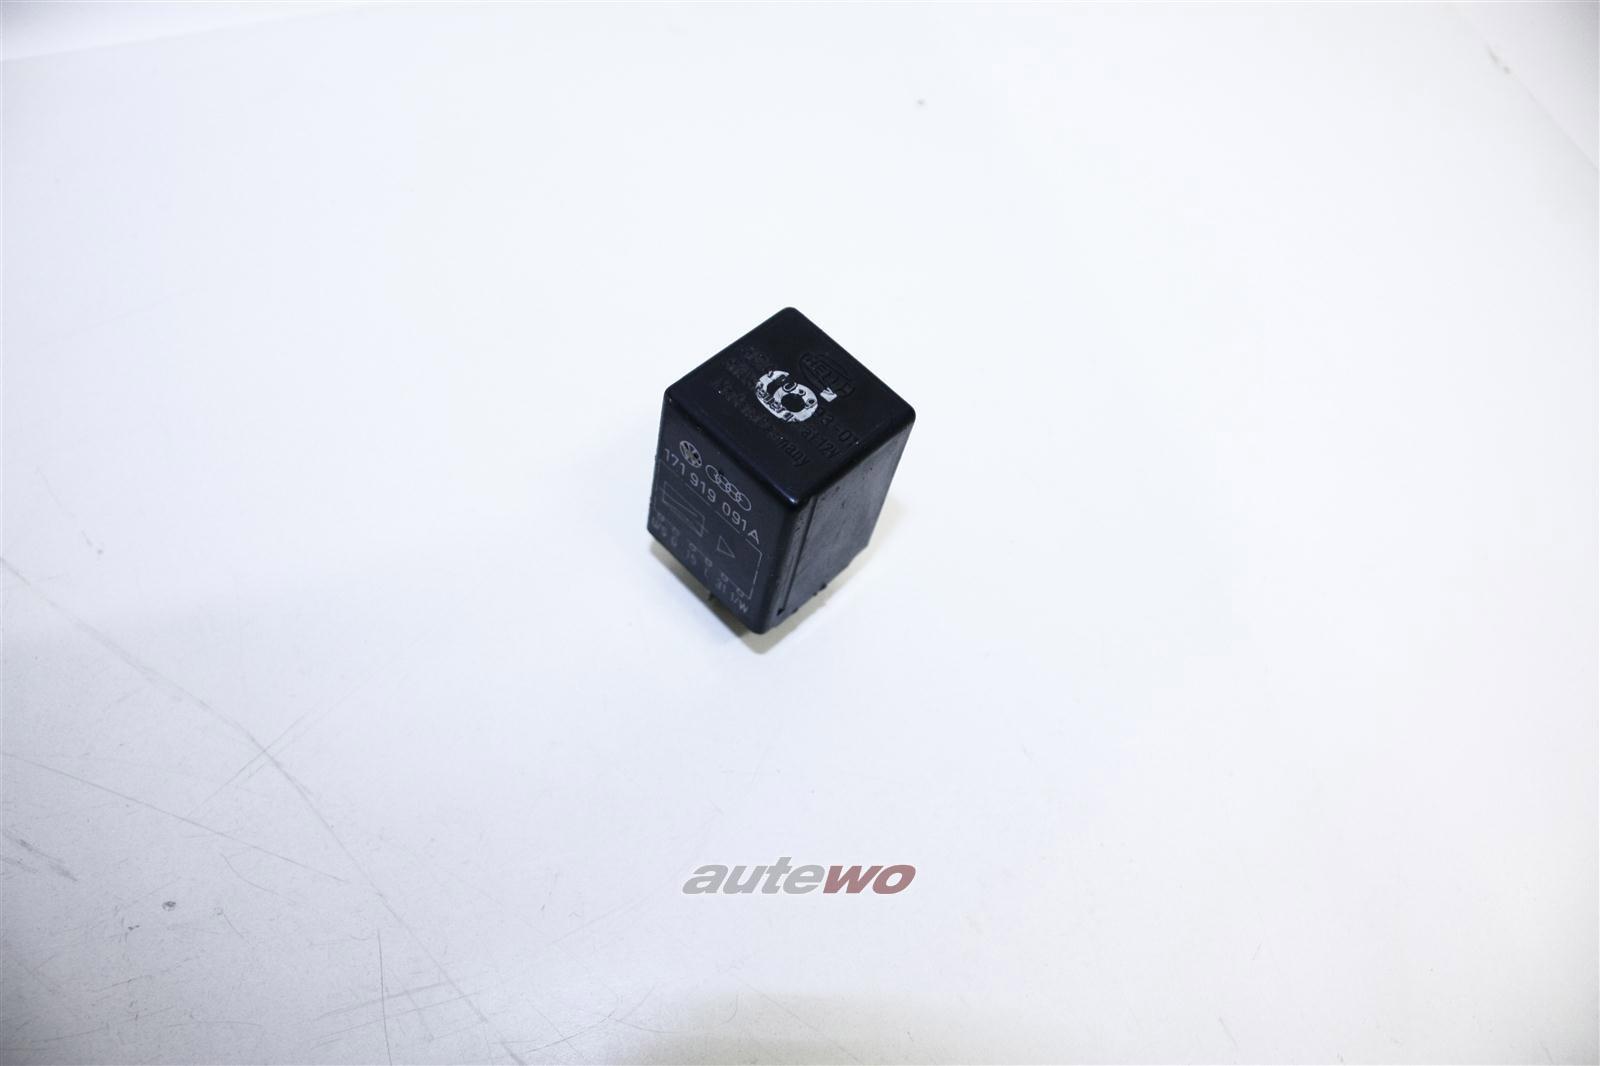 Audi 80/90/100/200 5 Zylinder Relais 6 Schalt- & Verbrauchsanzeige 171919091A